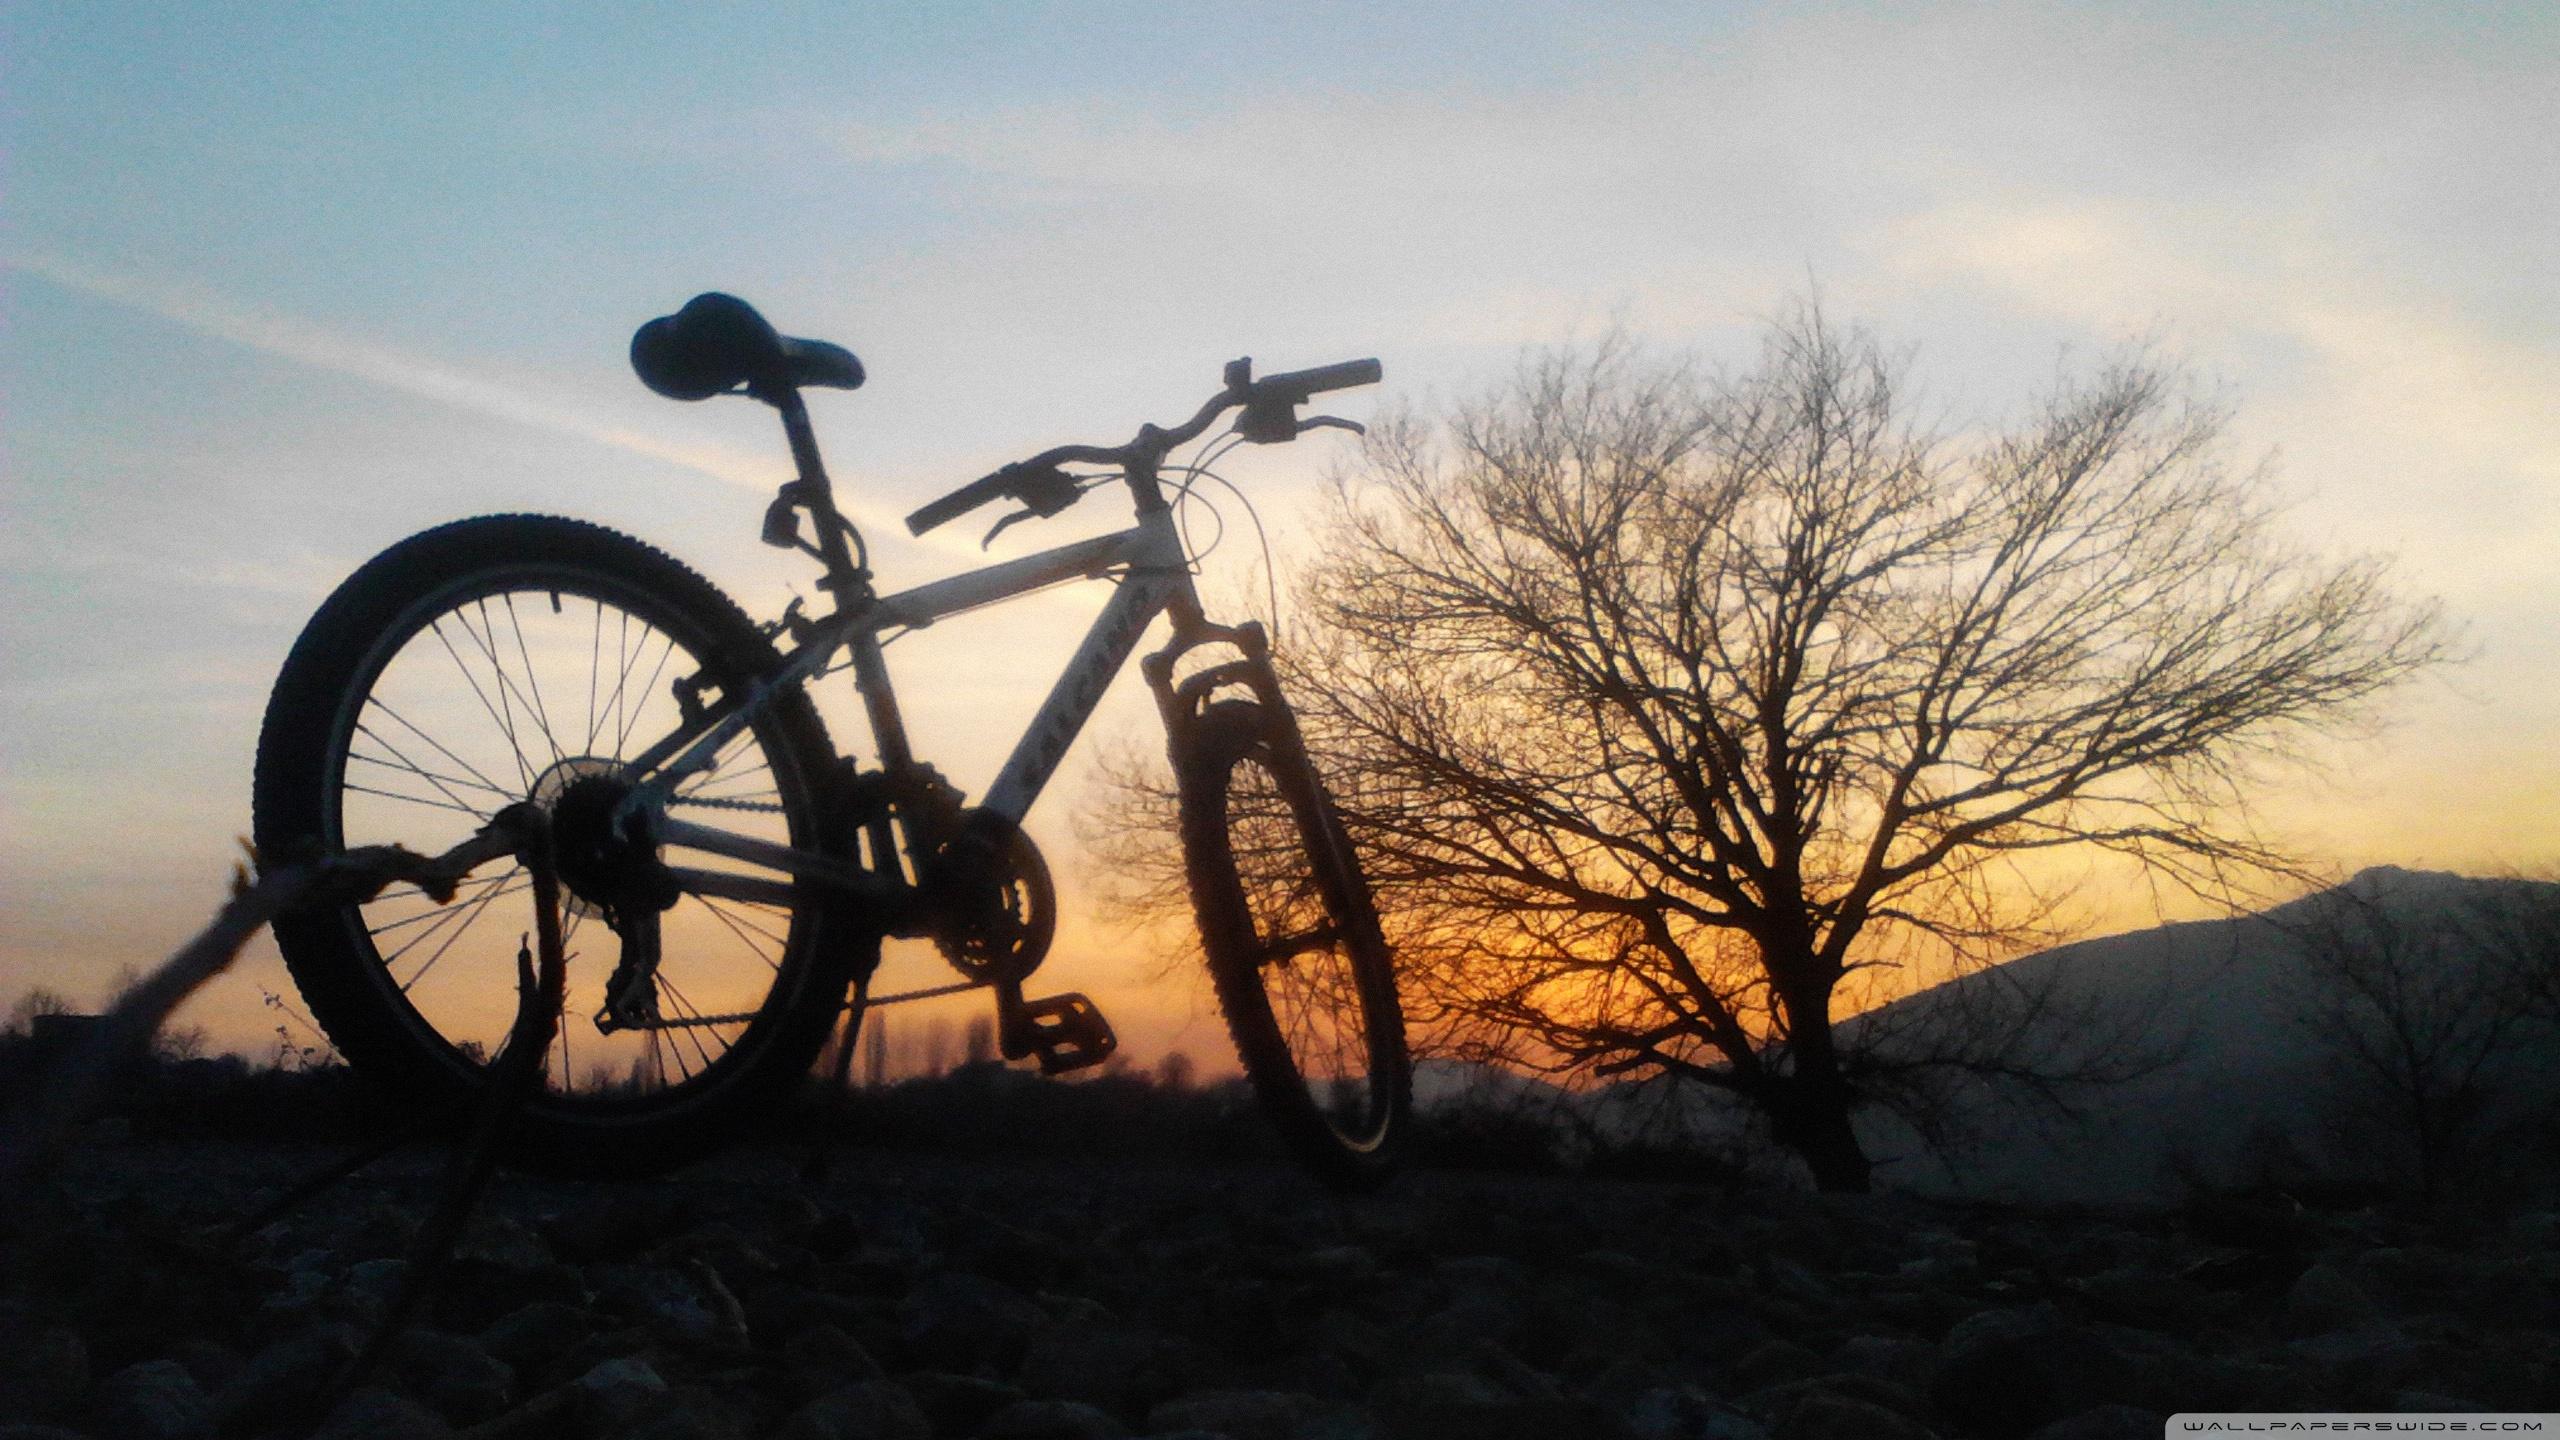 Bike and Sunset ❤ 4K HD Desktop Wallpaper for 4K Ultra HD TV